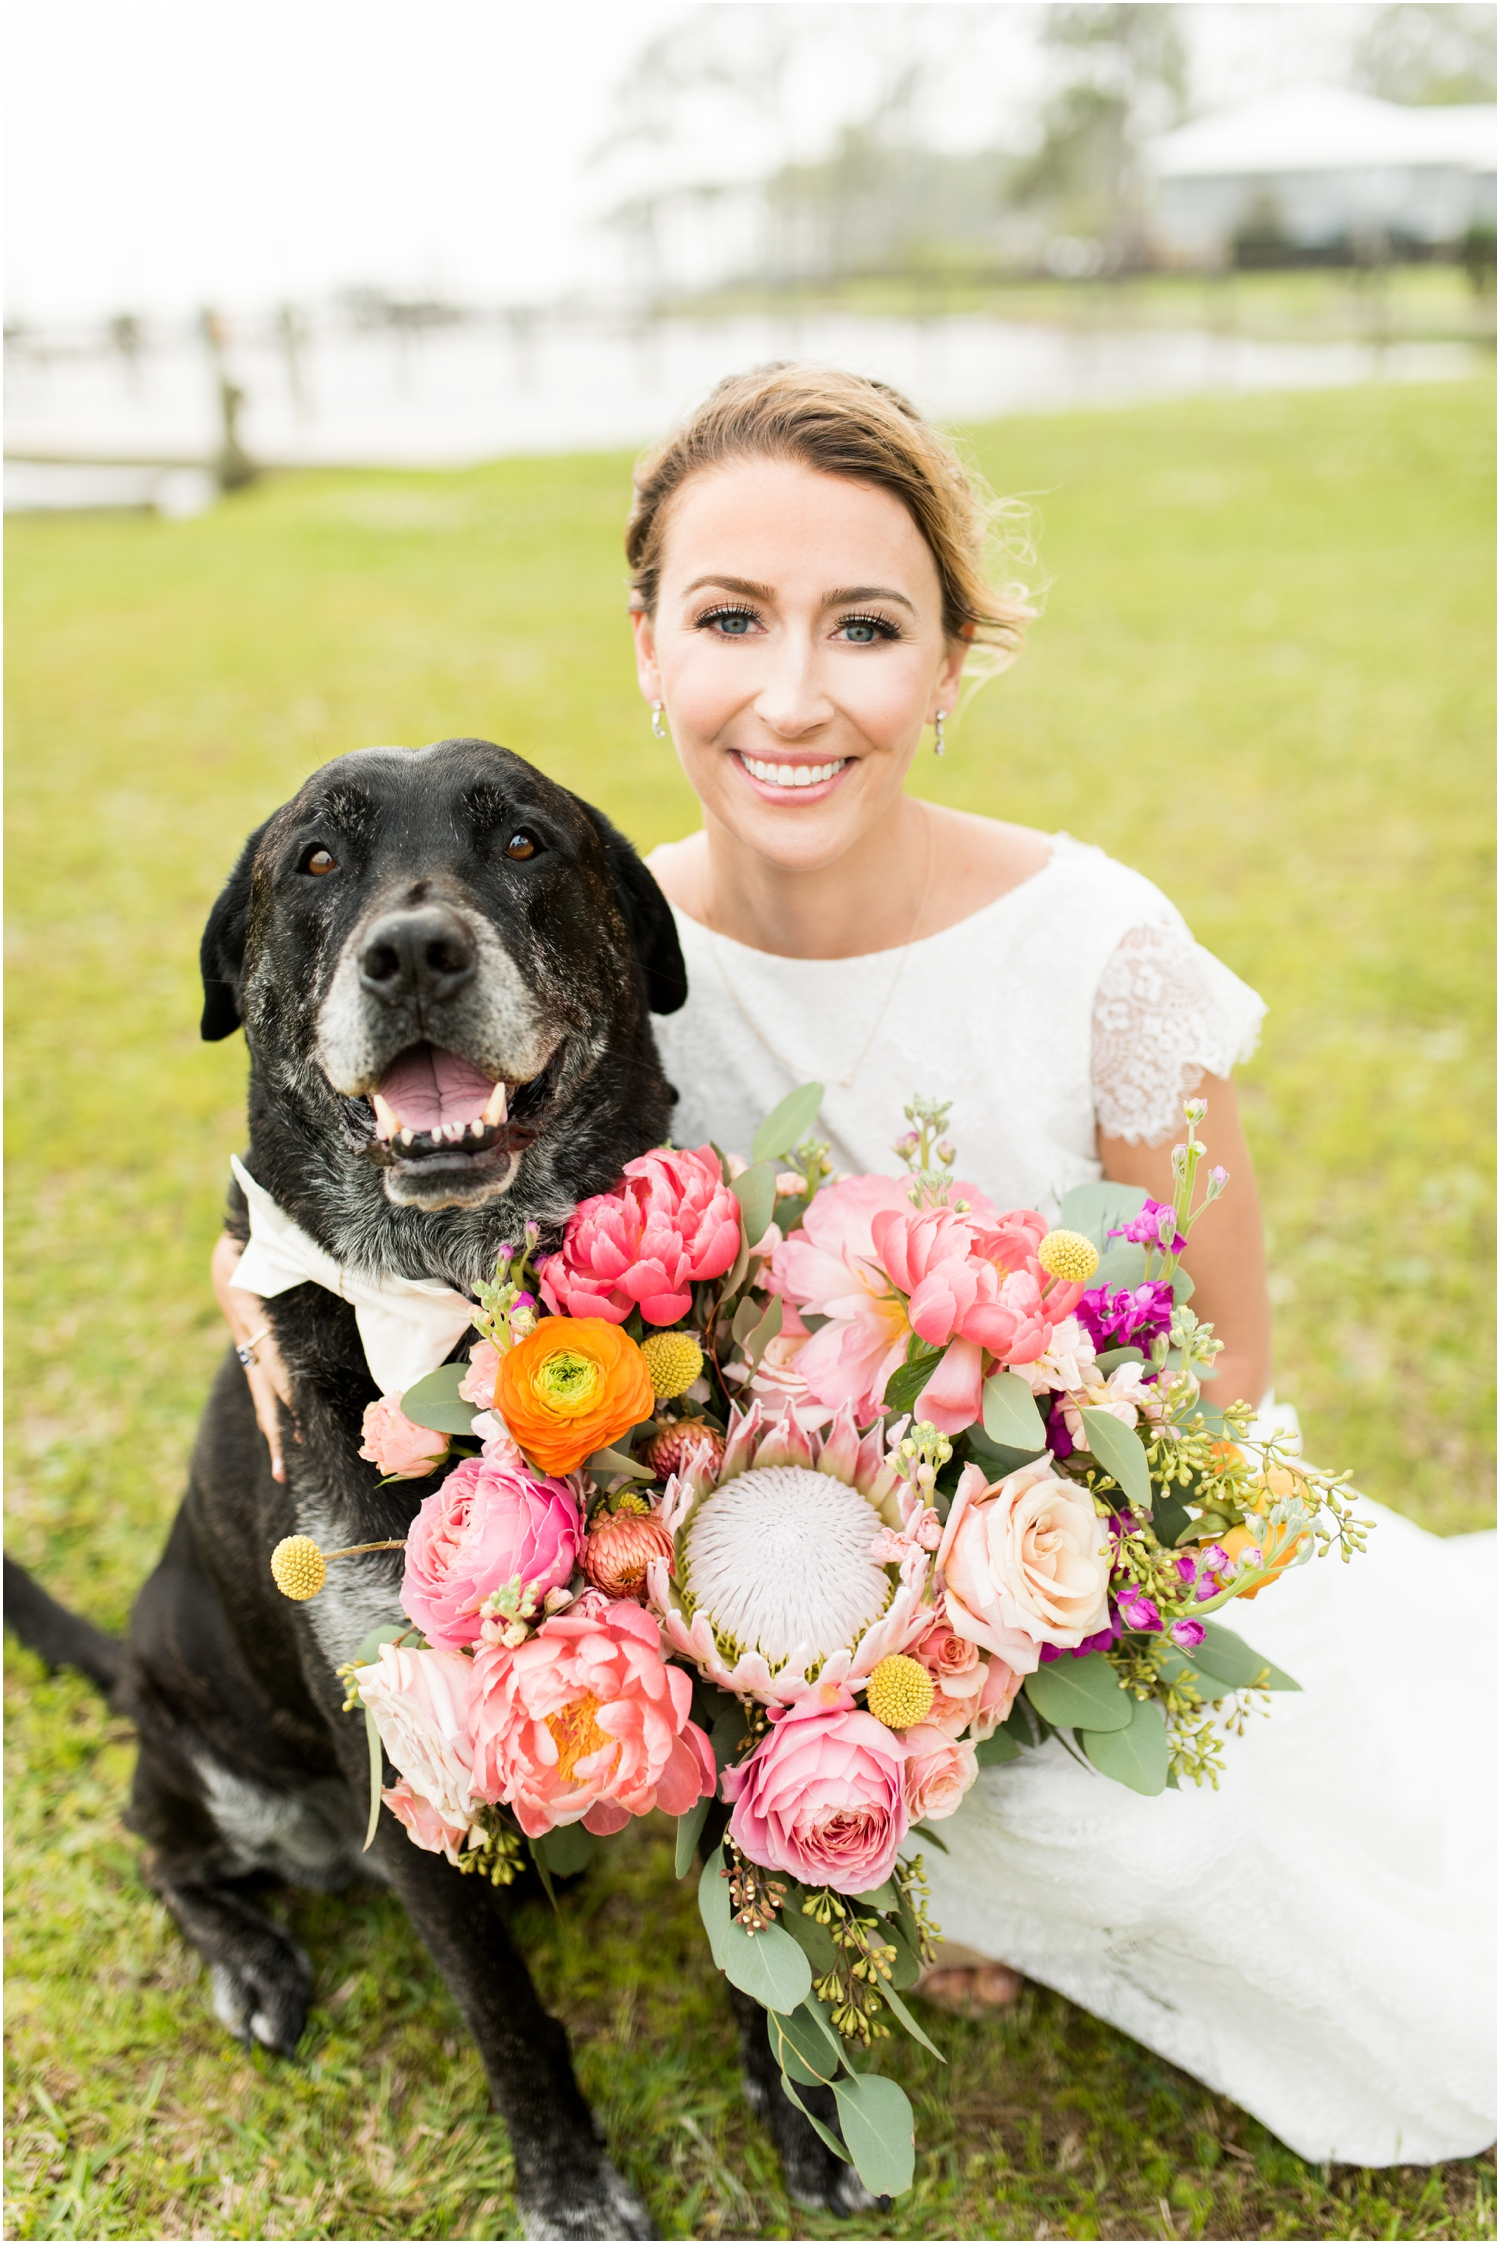 Gulf Shores Orange Beach Alabama Family Home on the Water Wedding Photographer dog fur baby ring bearer